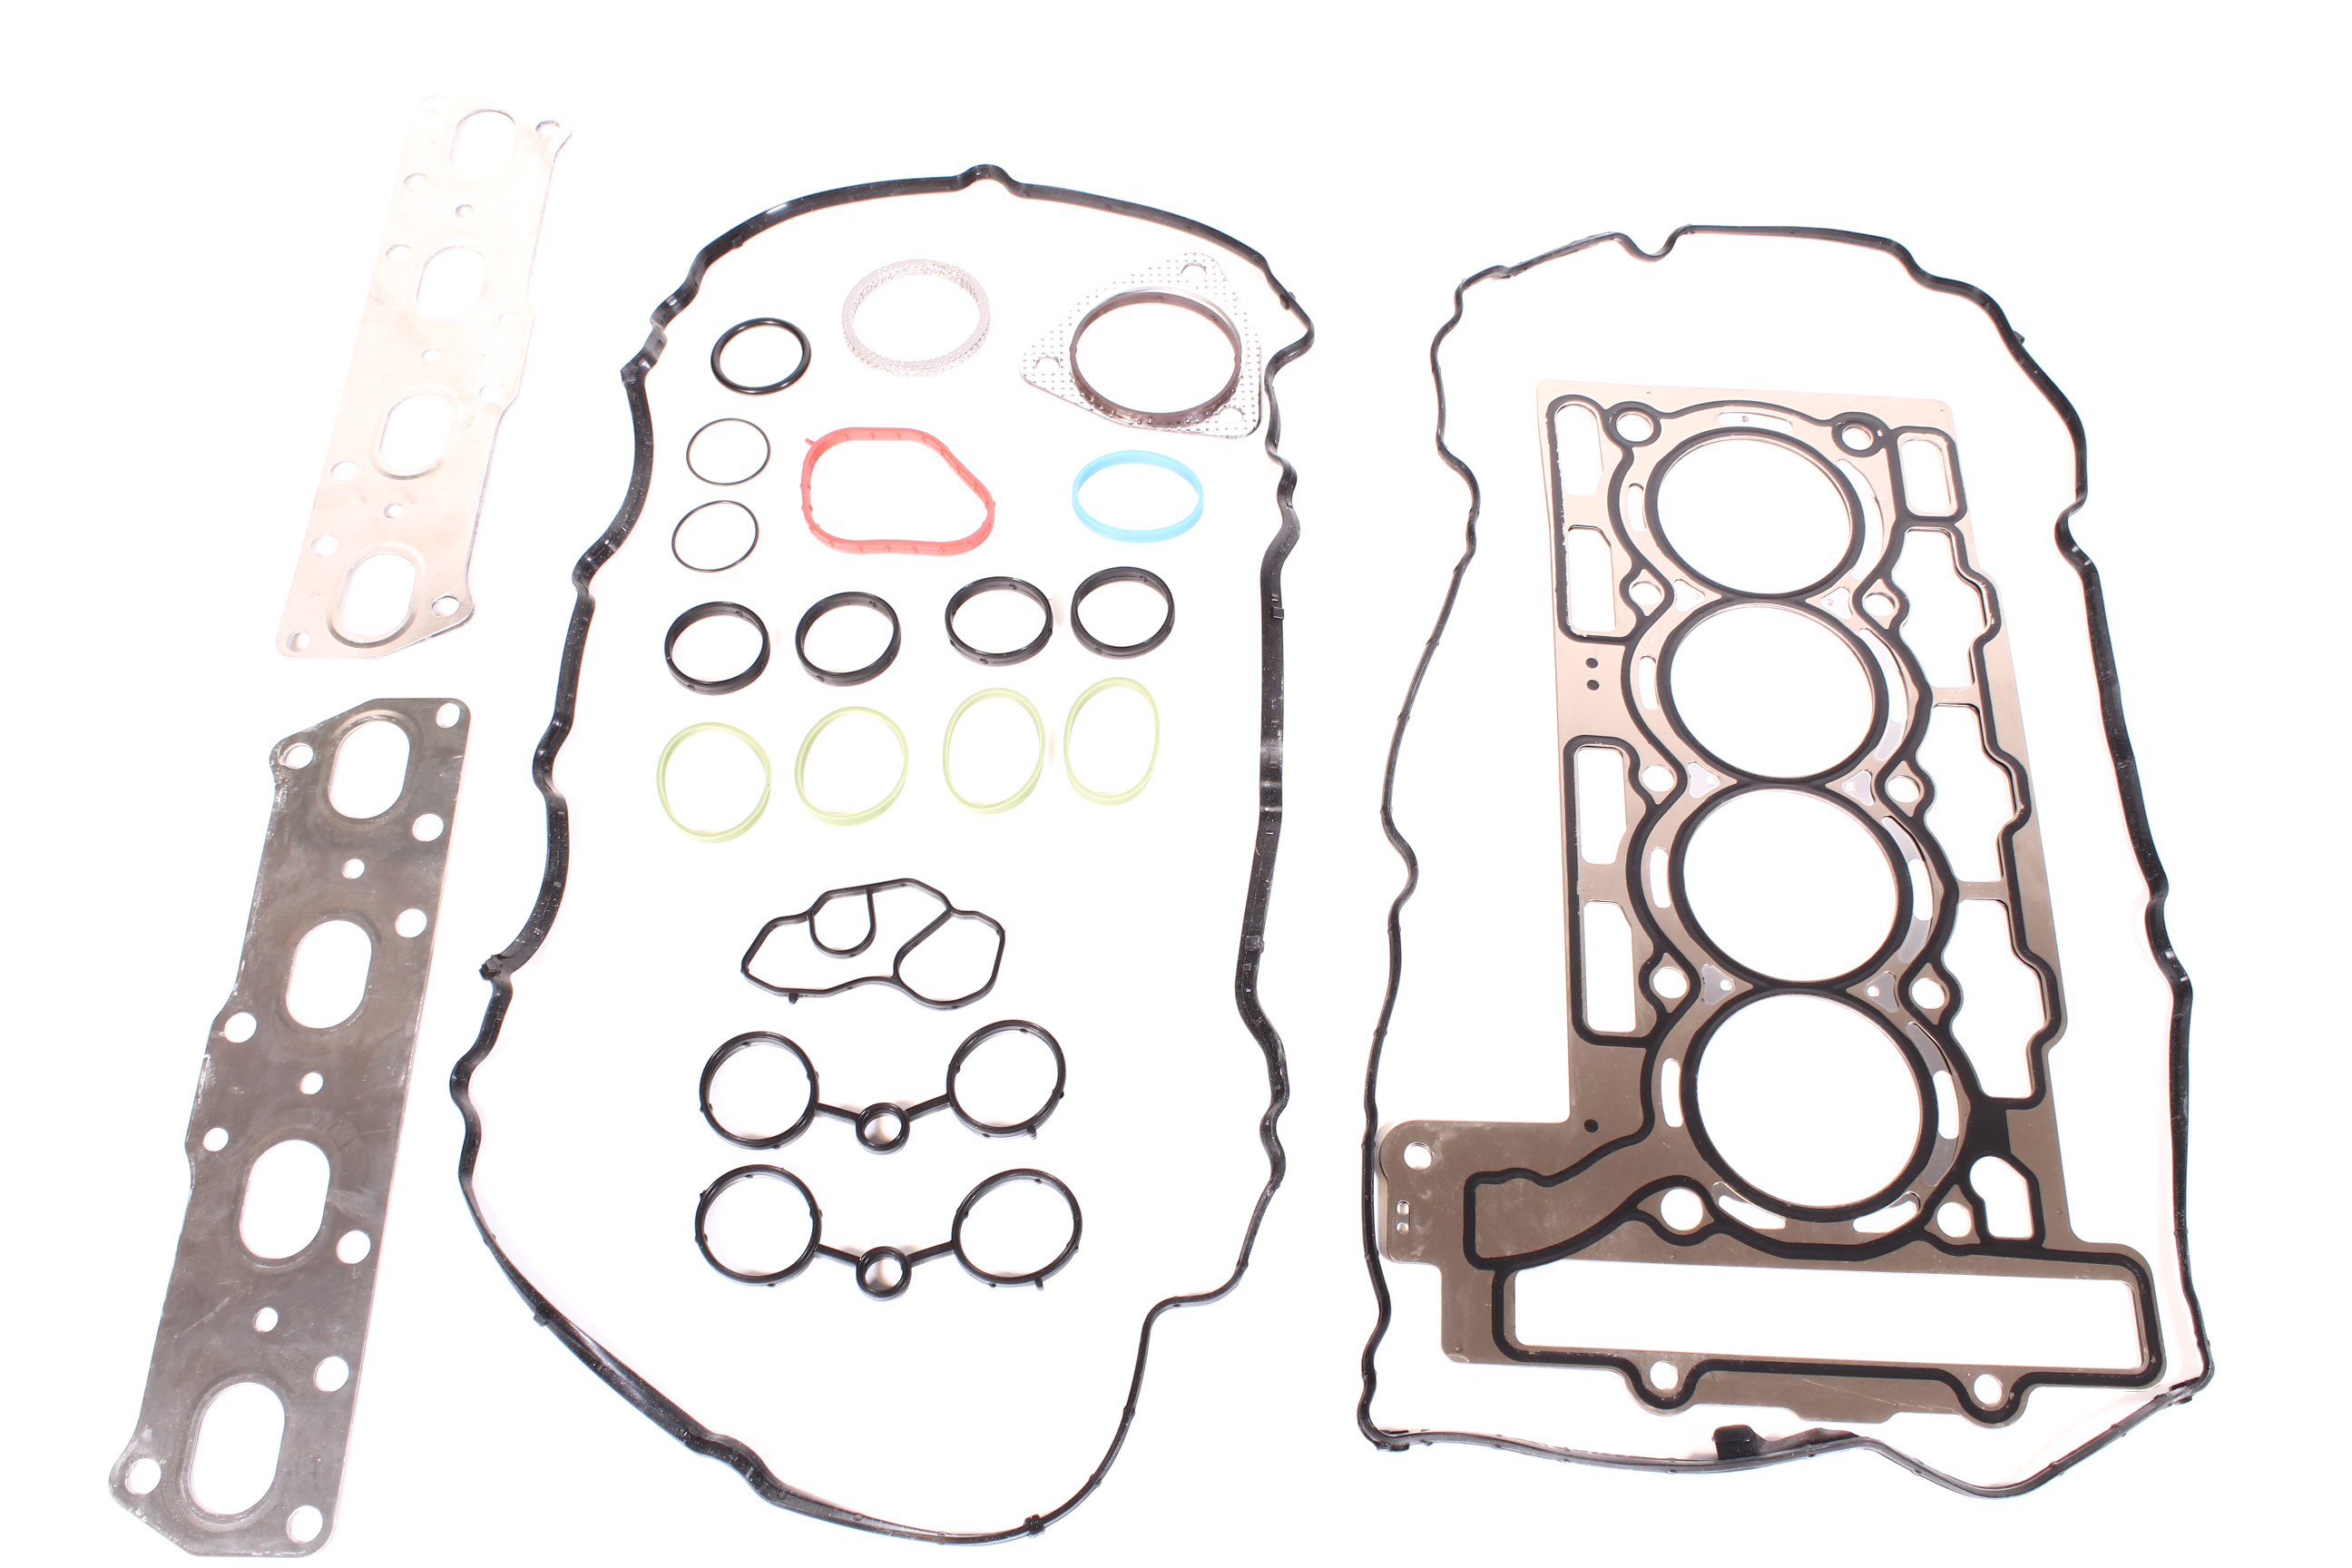 Zylinderkopfdichtung Dichtungssatz BMW Mini 1,6 N13B16A N18B16A 7601077 NEU